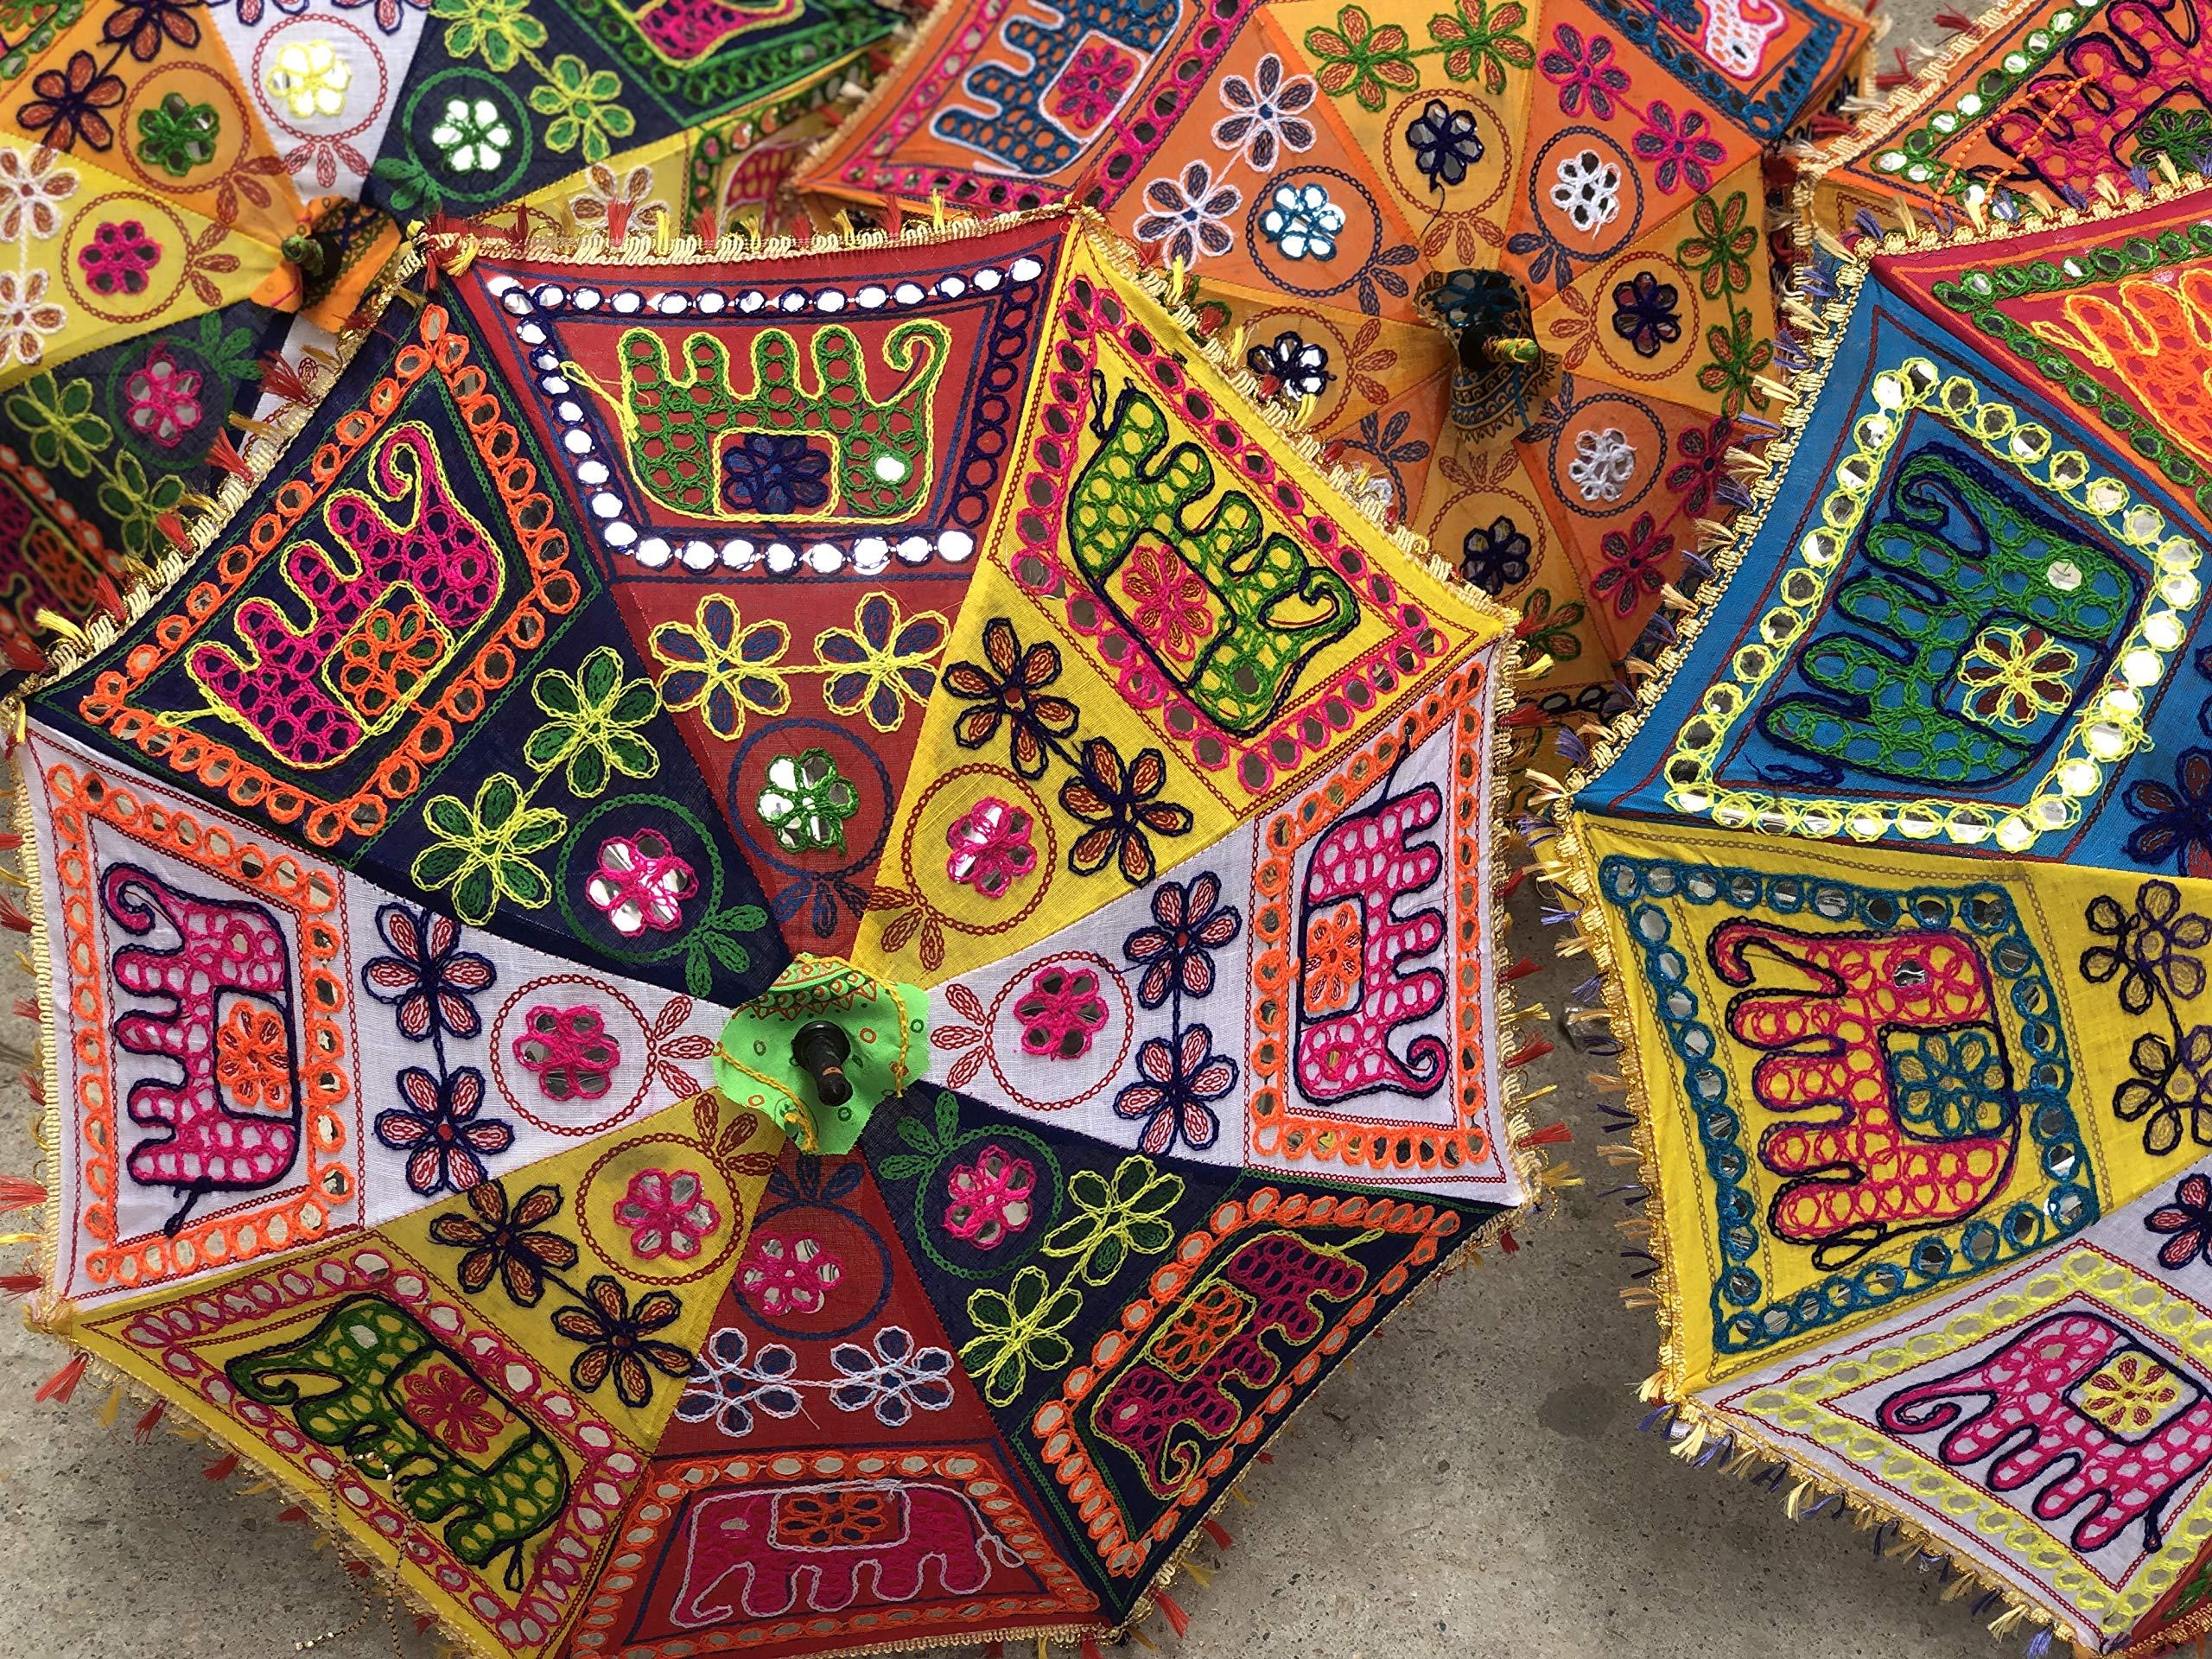 GANESHAM Indian Multi Colored Beach Umbrella UV Protection Umbrella Sun Umbrella Embroidery Boho Parasol Indian Wedding Umbrellas Parasol (5pc) (Elephant) by GANESHAM